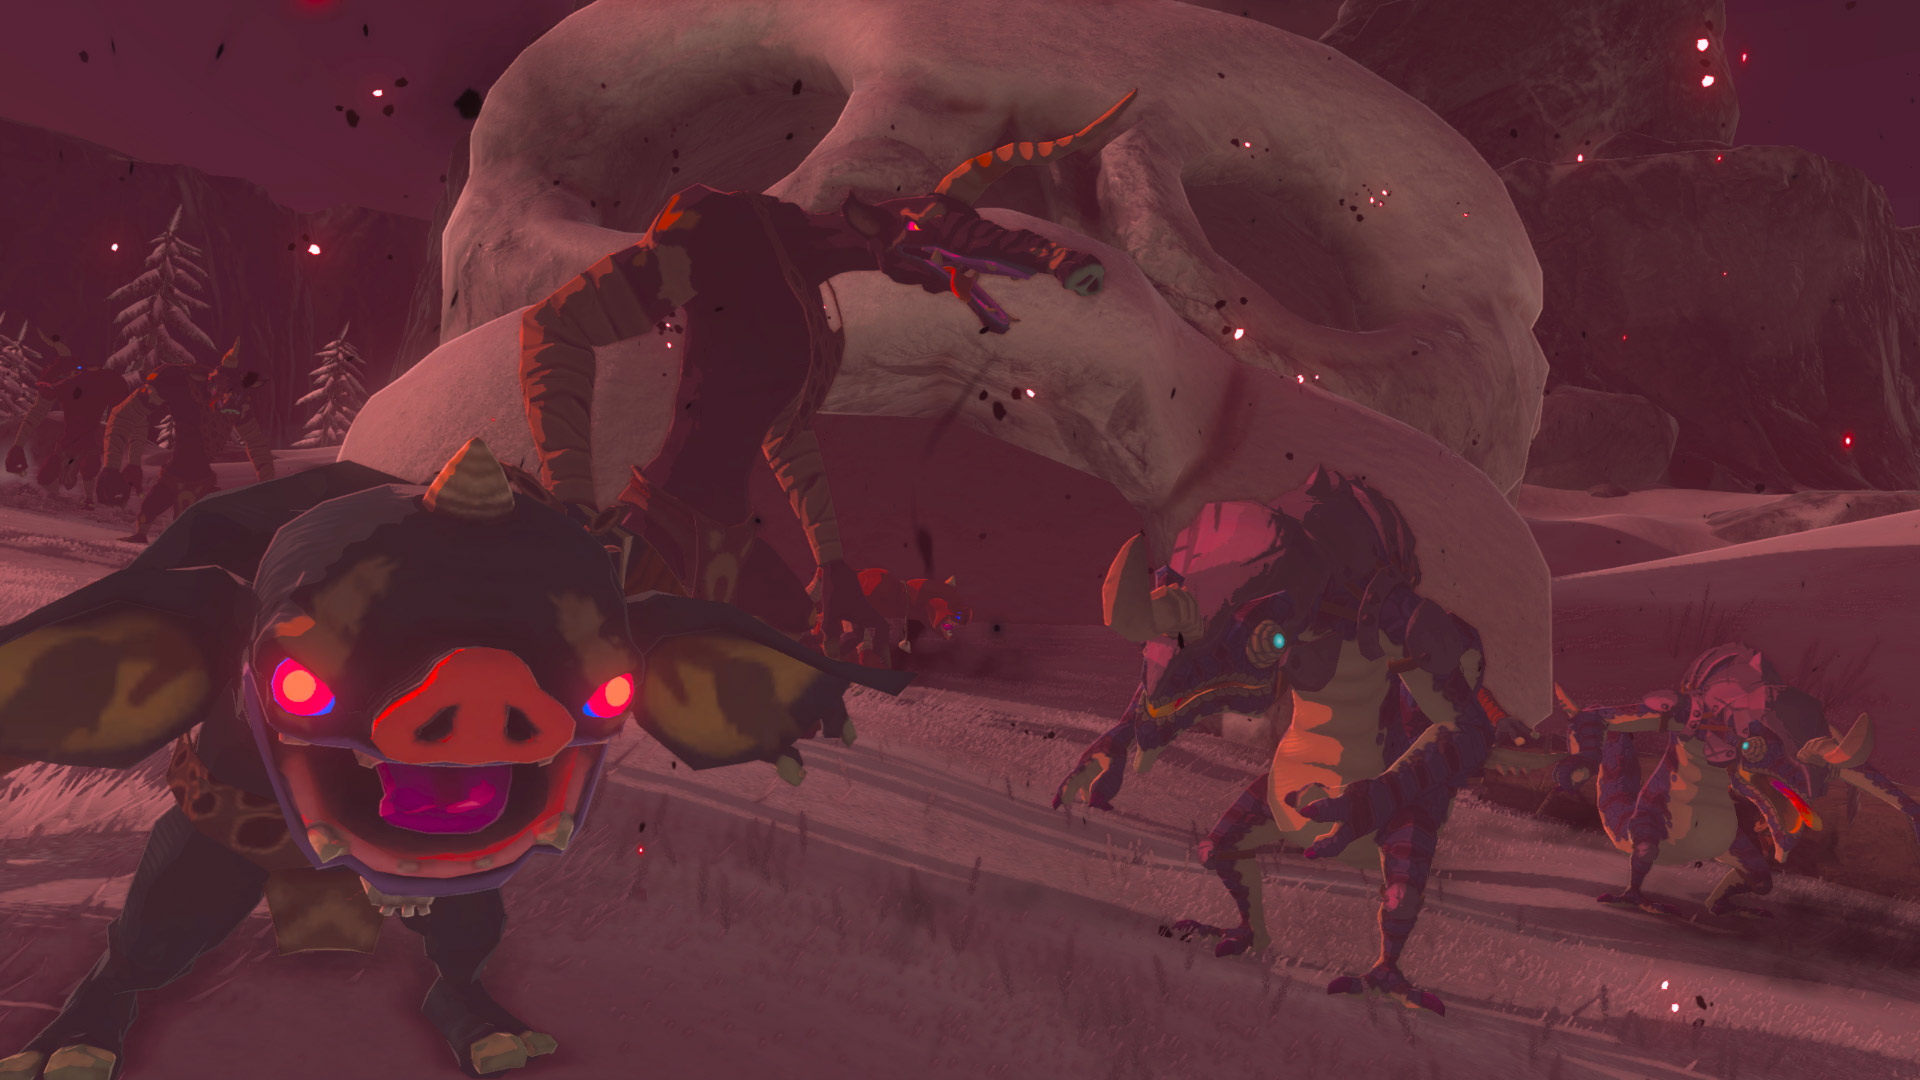 Nové screenshoty z The Legend of Zelda: Breath of the Wild 139303